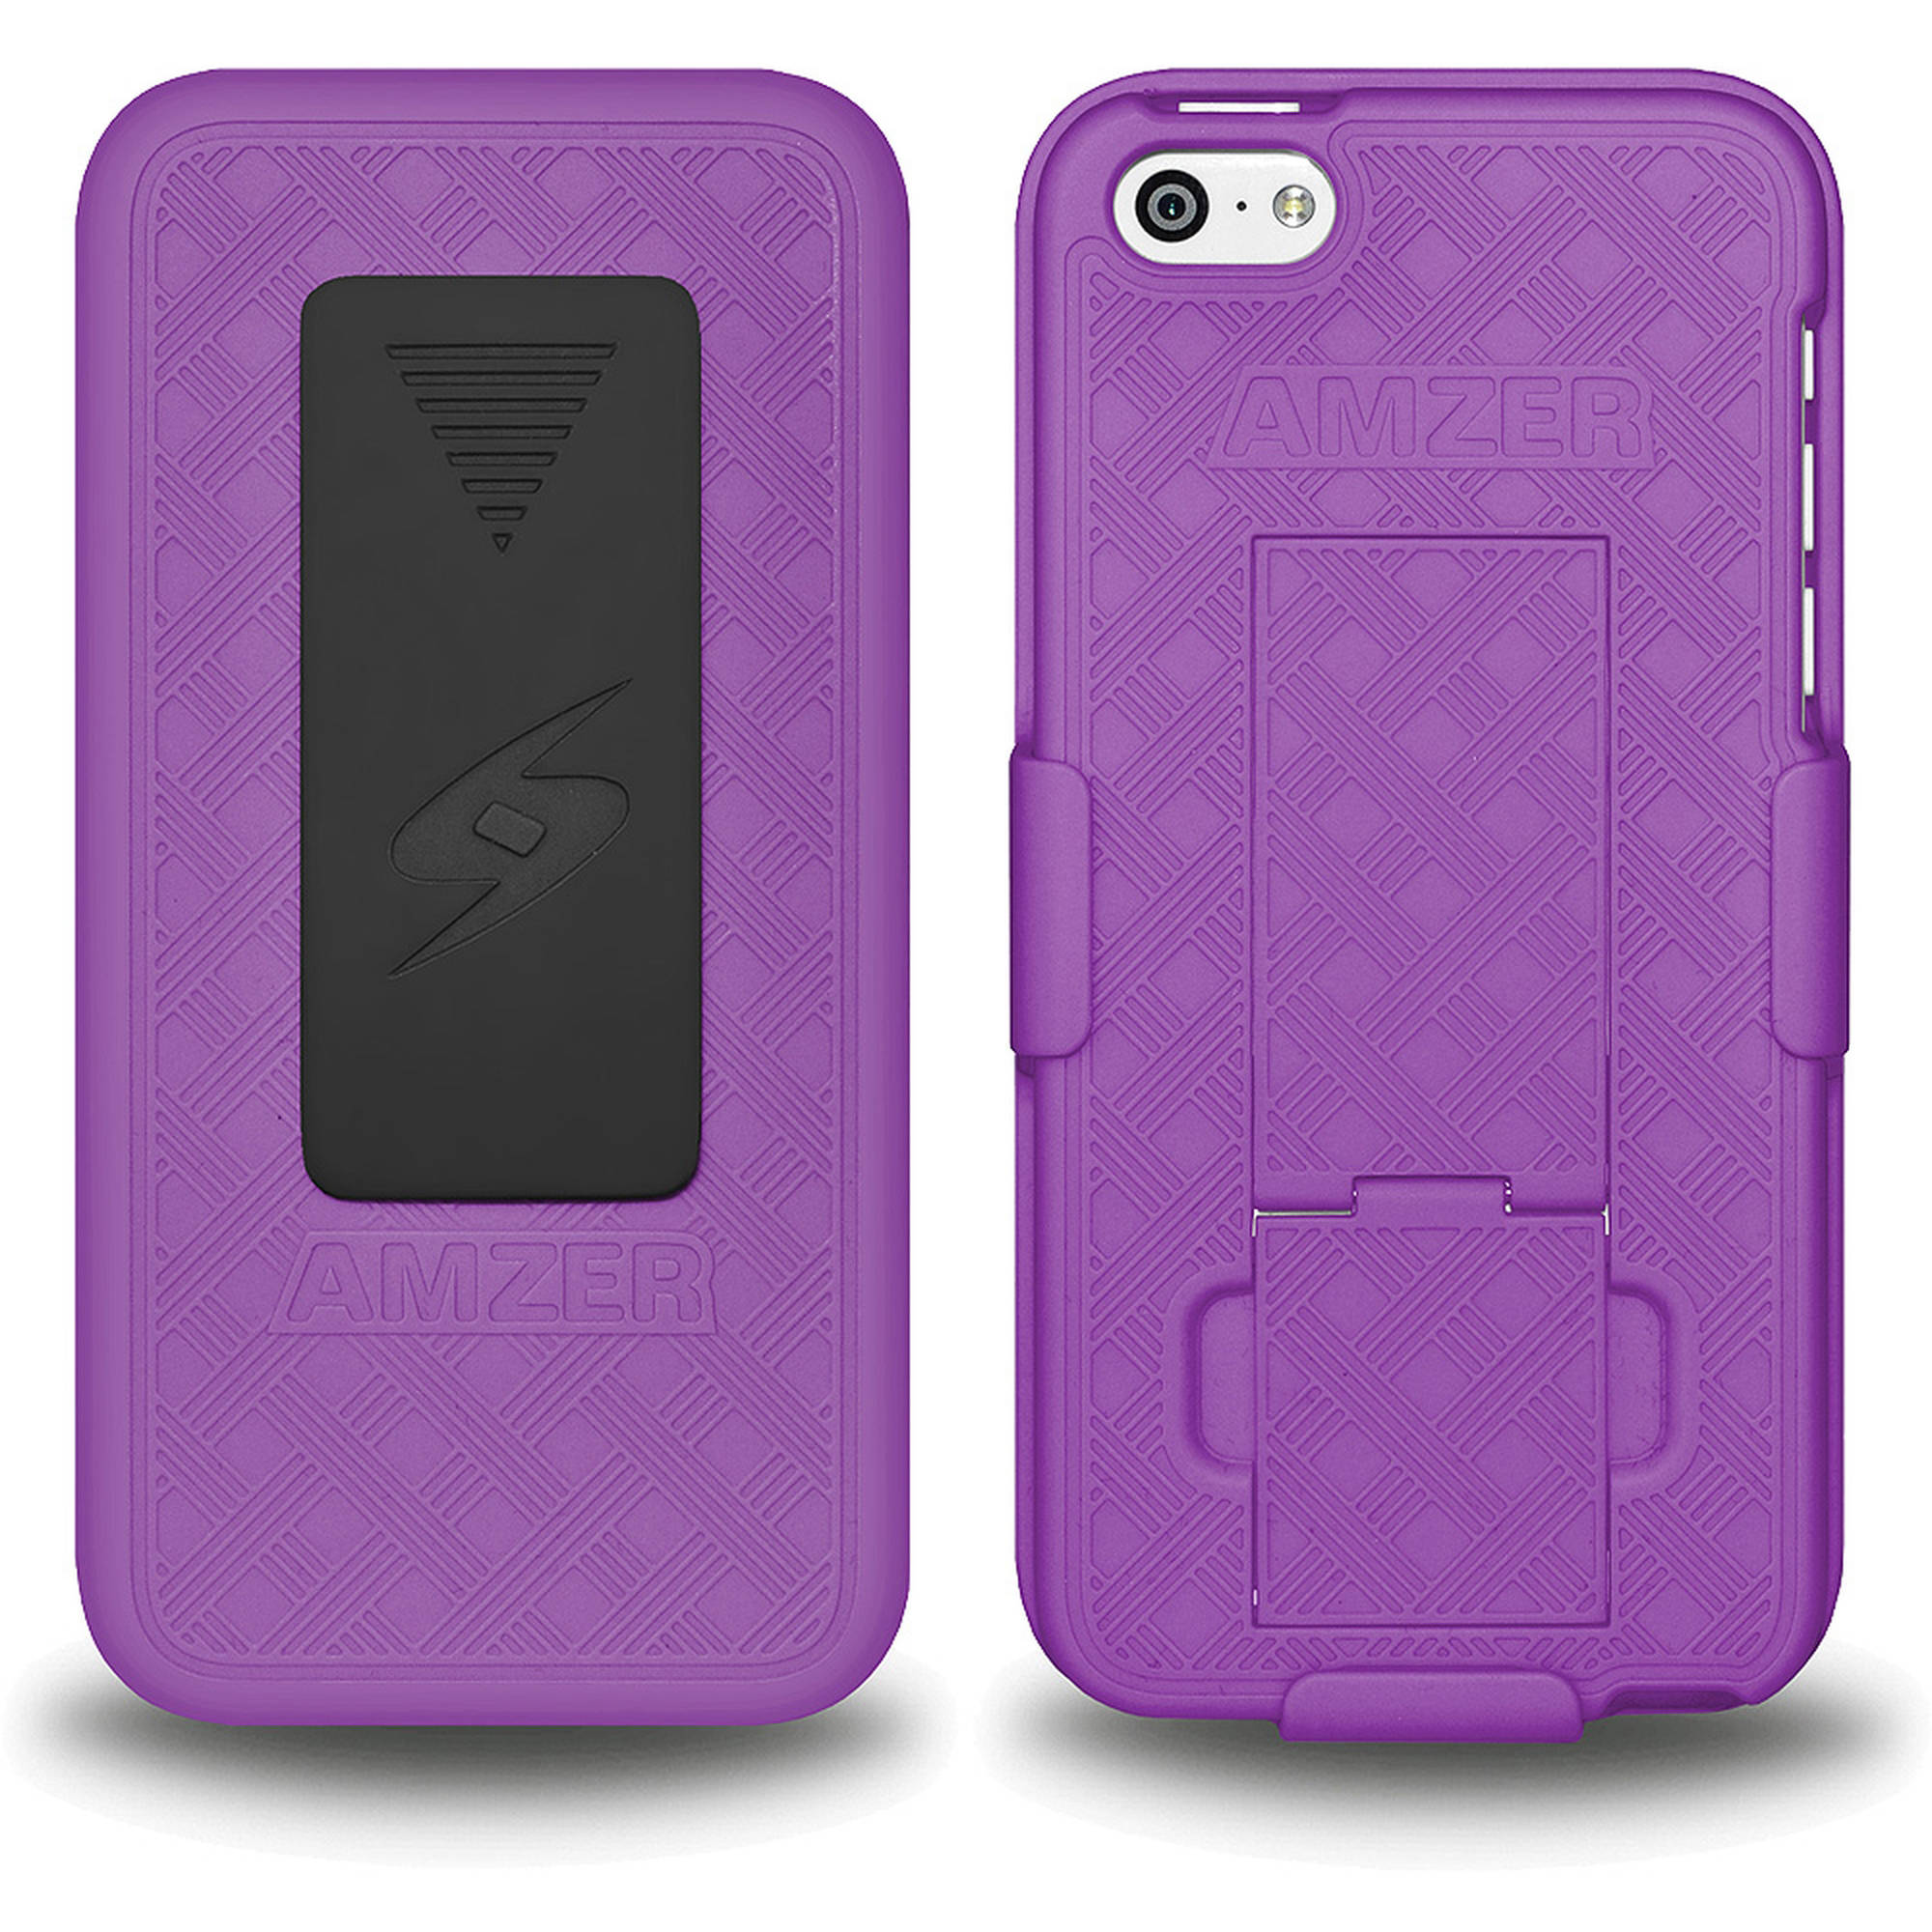 AMZER Shellster Case with Kickstand, Purple